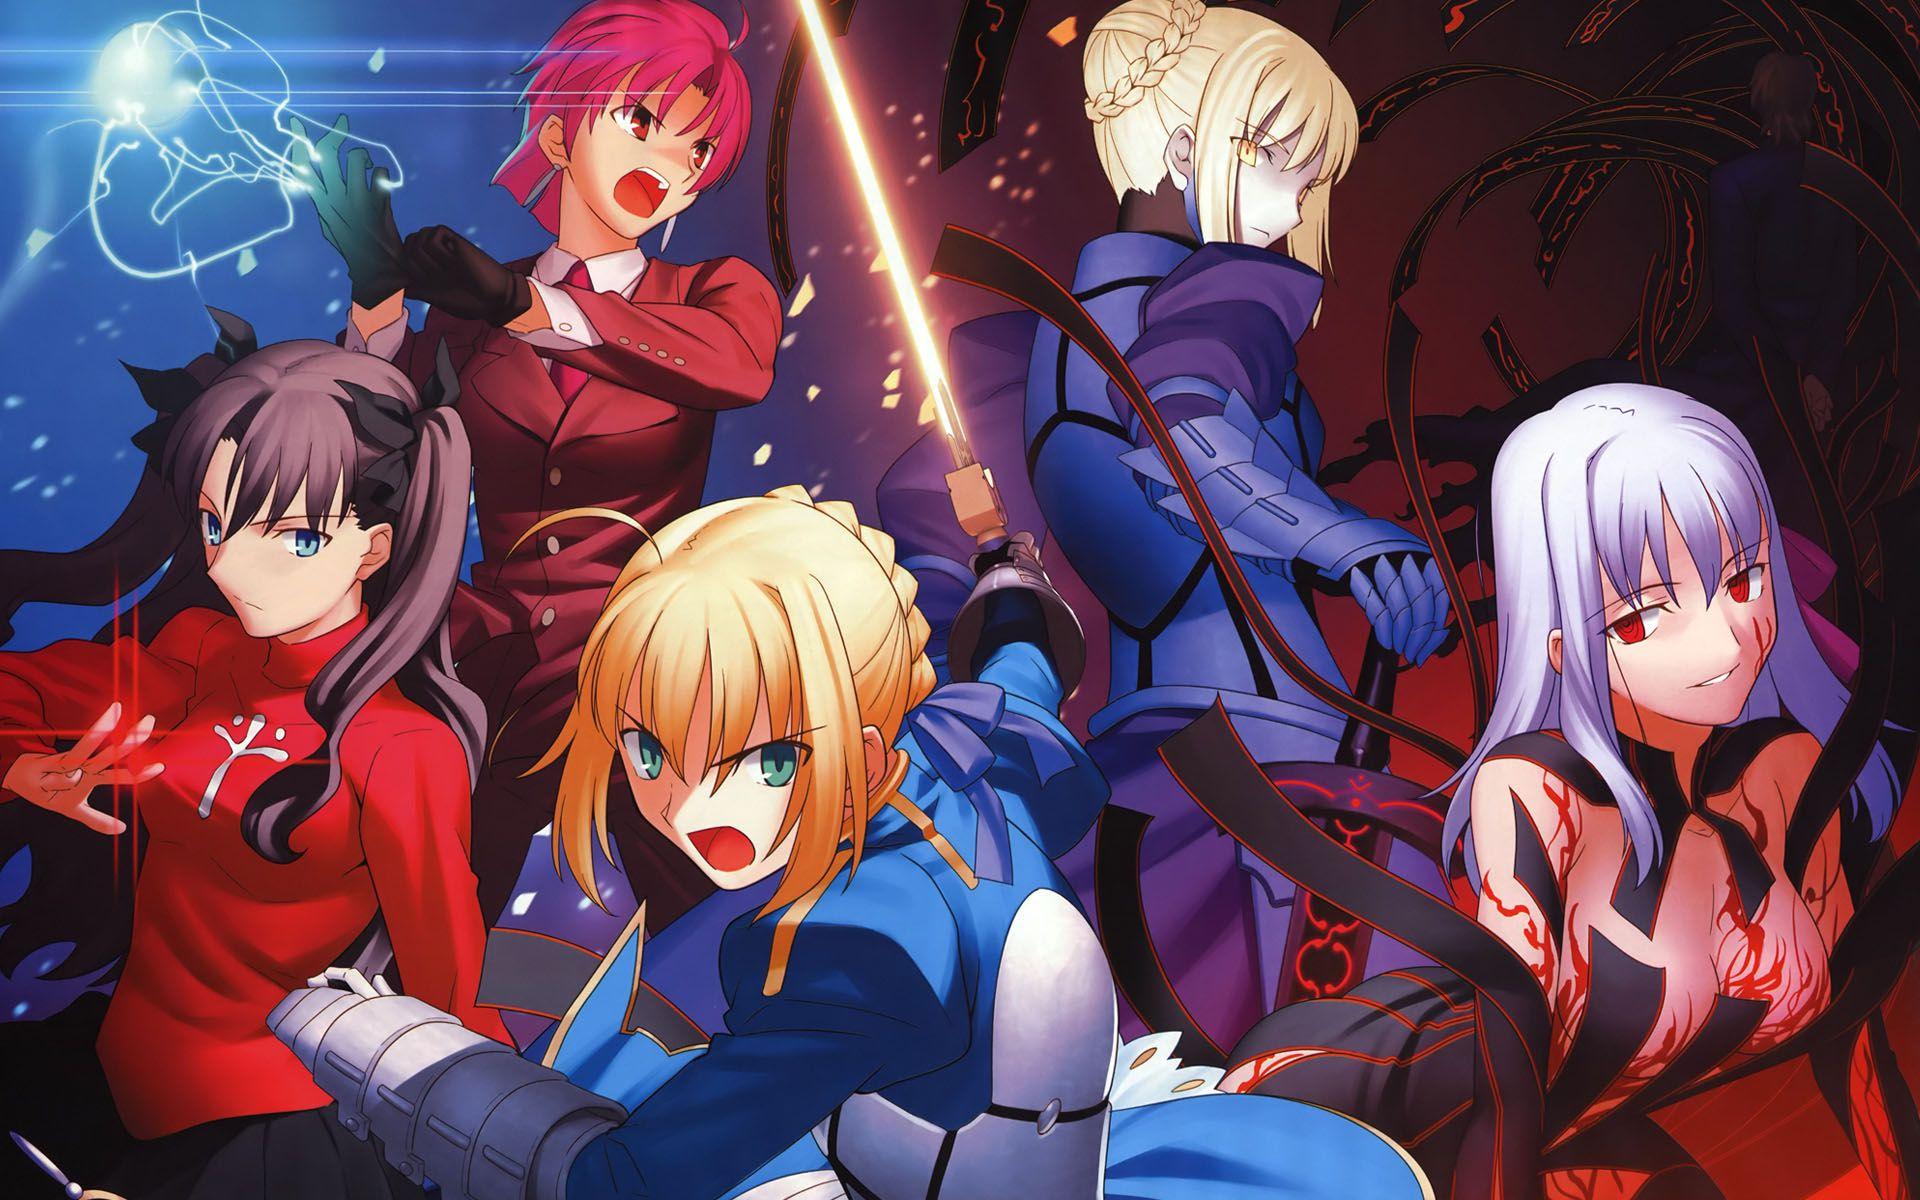 Nahu And Friends Fate Hollow Ataraxia Novela Visual English Arte Anime Anime Artes